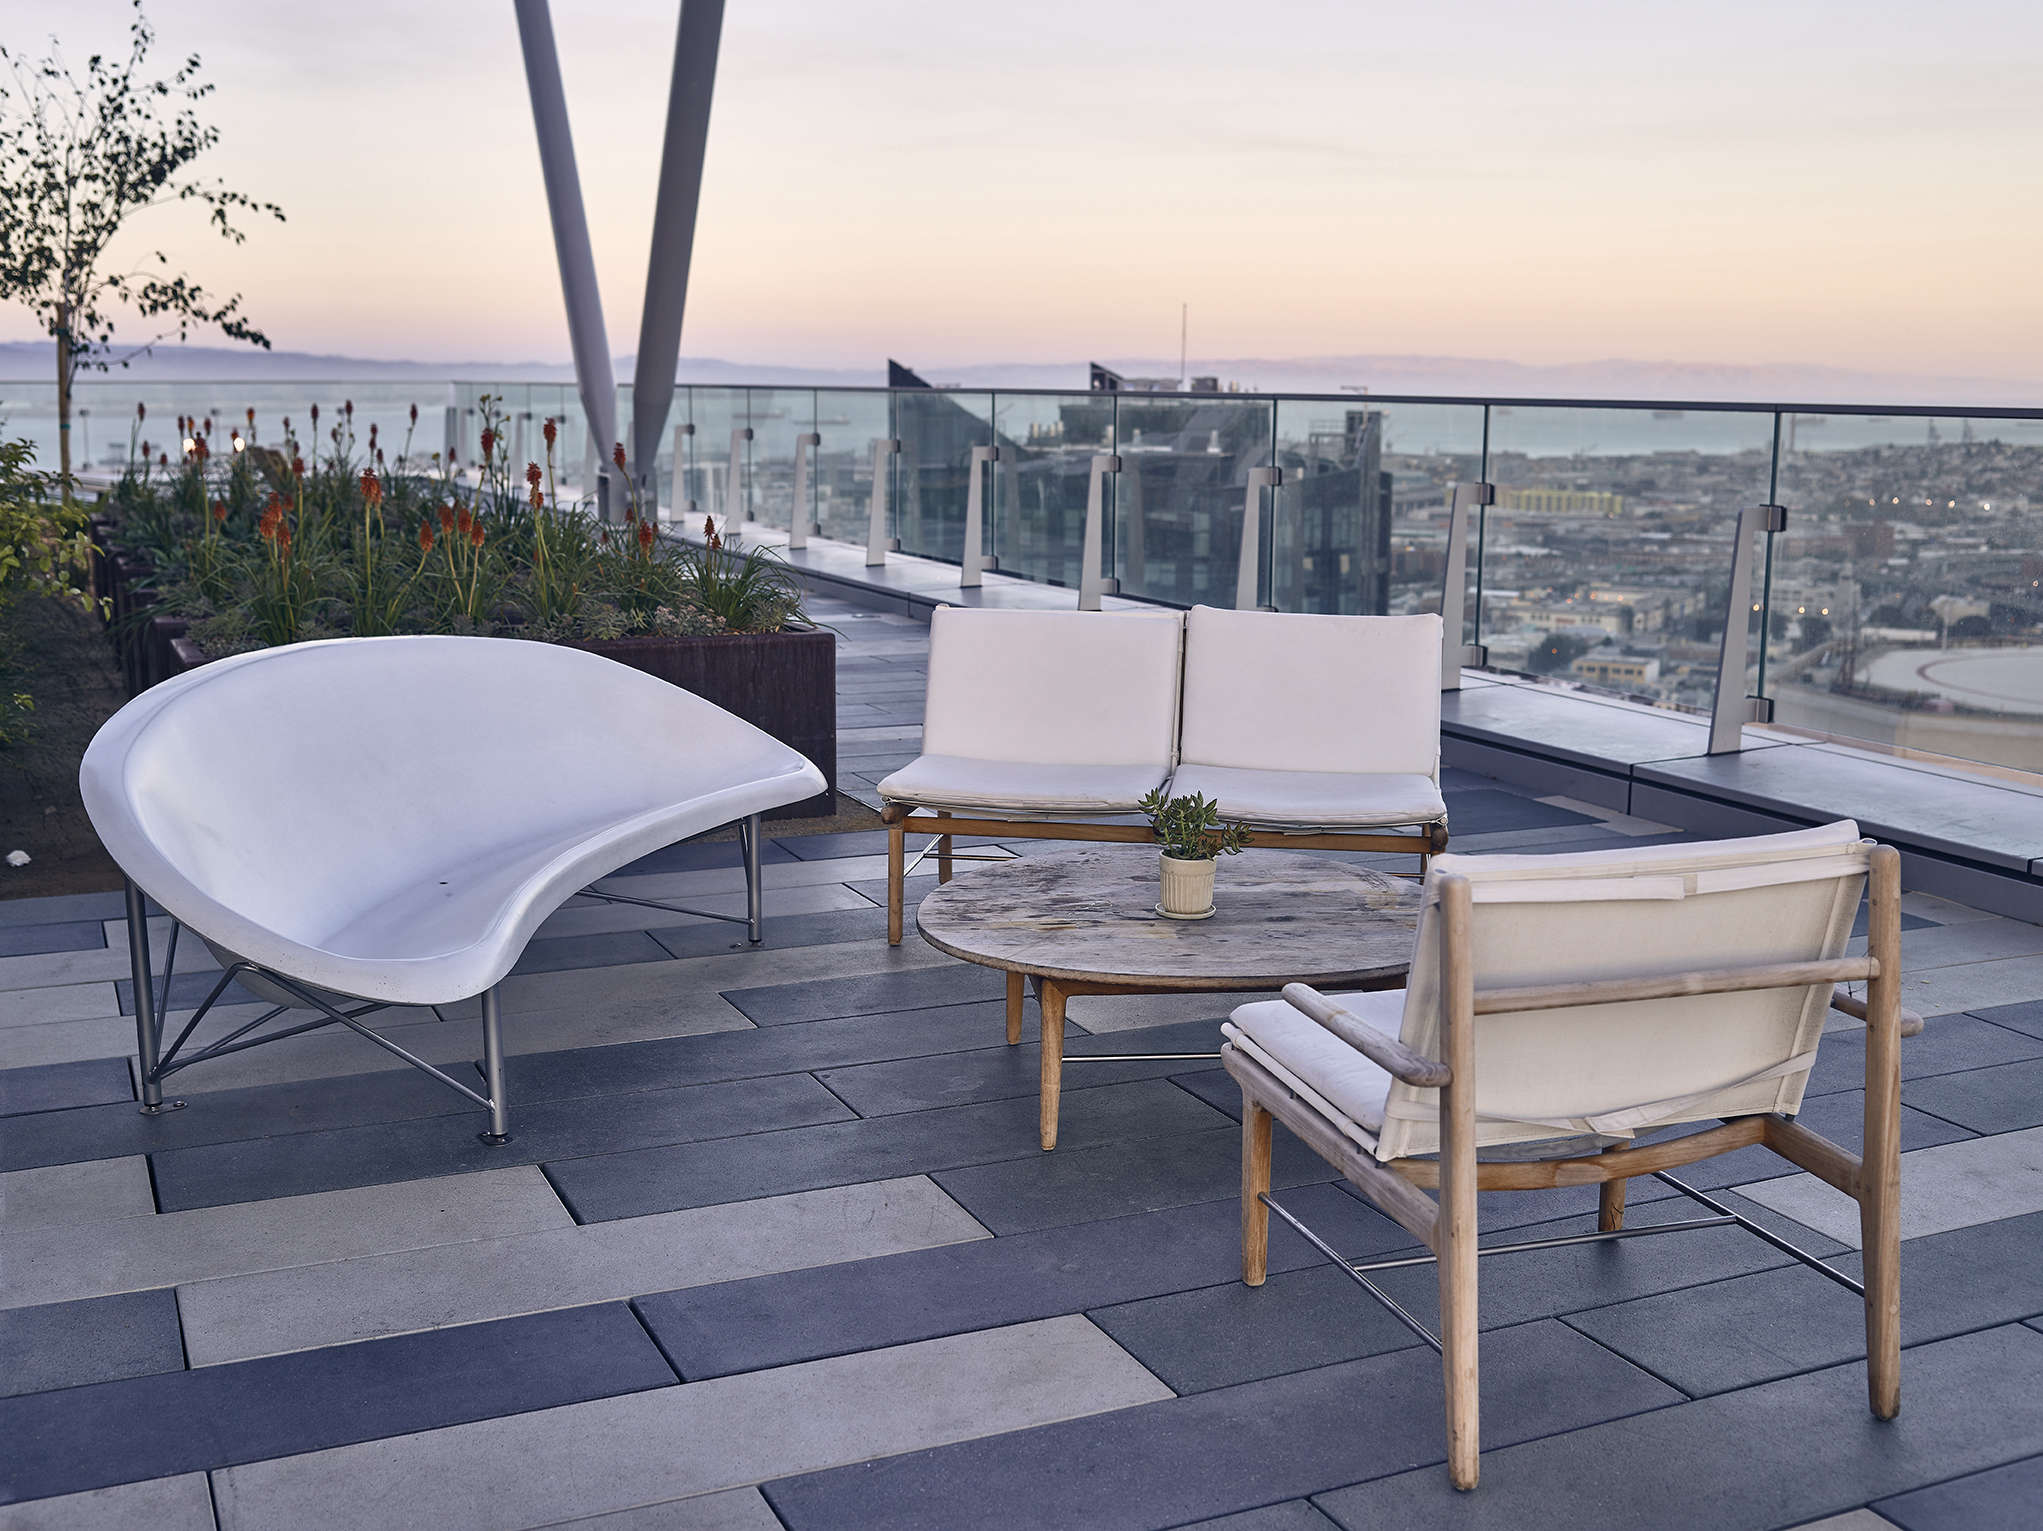 Galanter & Jones Heated Outdoor Furniture | Gardenista